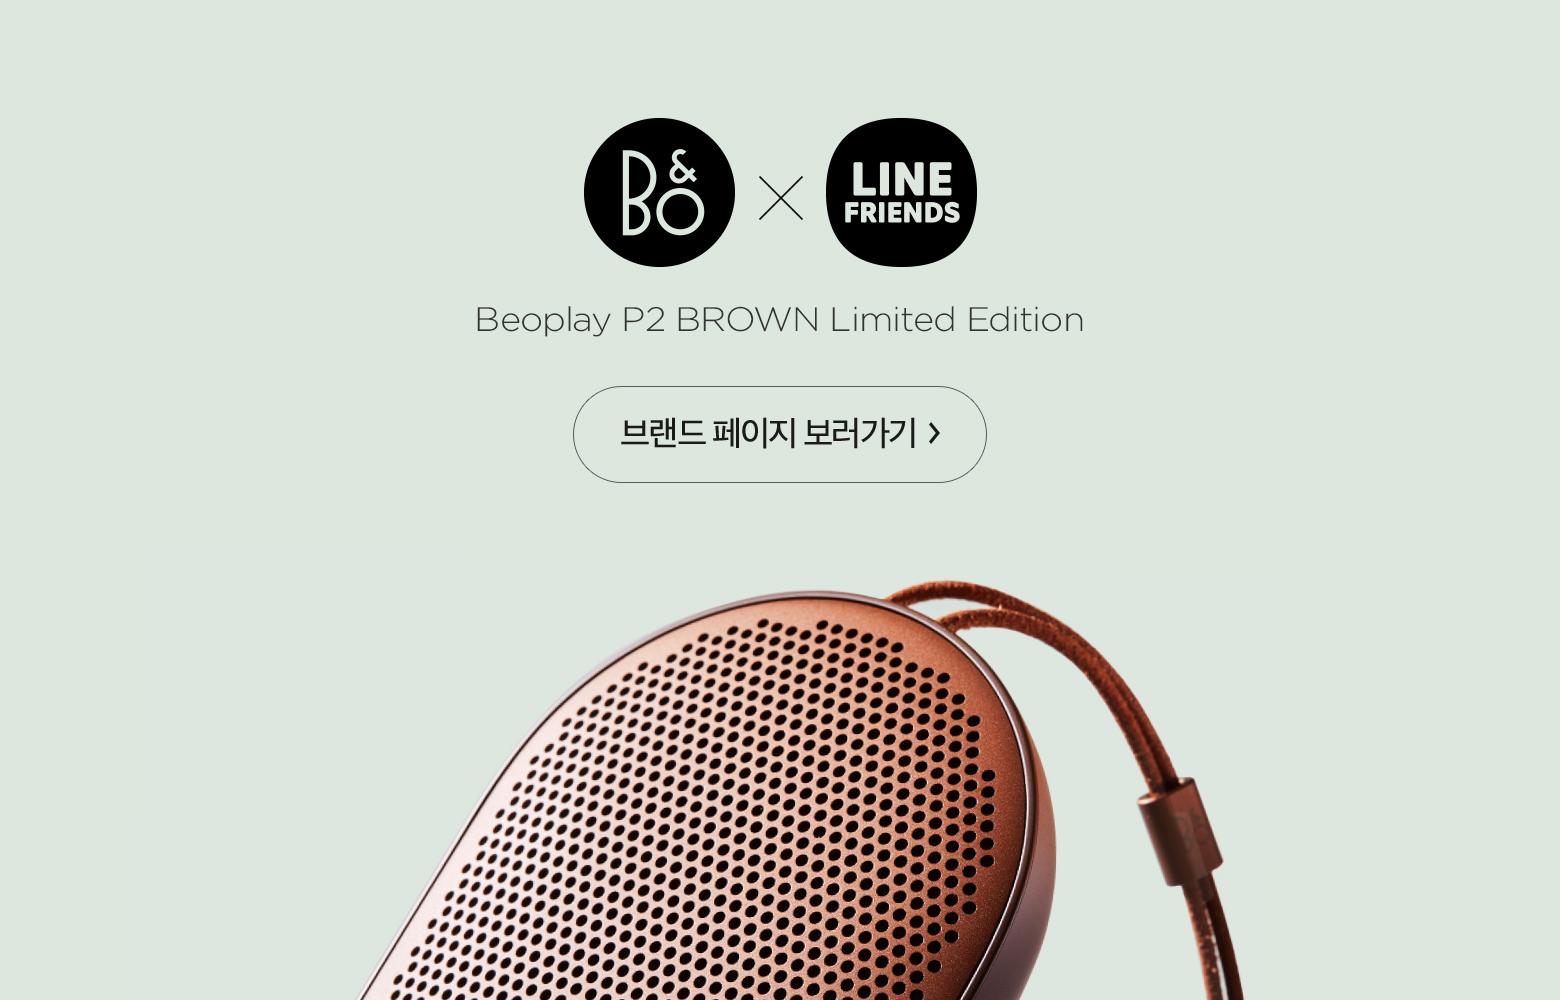 Beoplay P2 BROWN Limited Edition 브랜드 페이지 보러가기